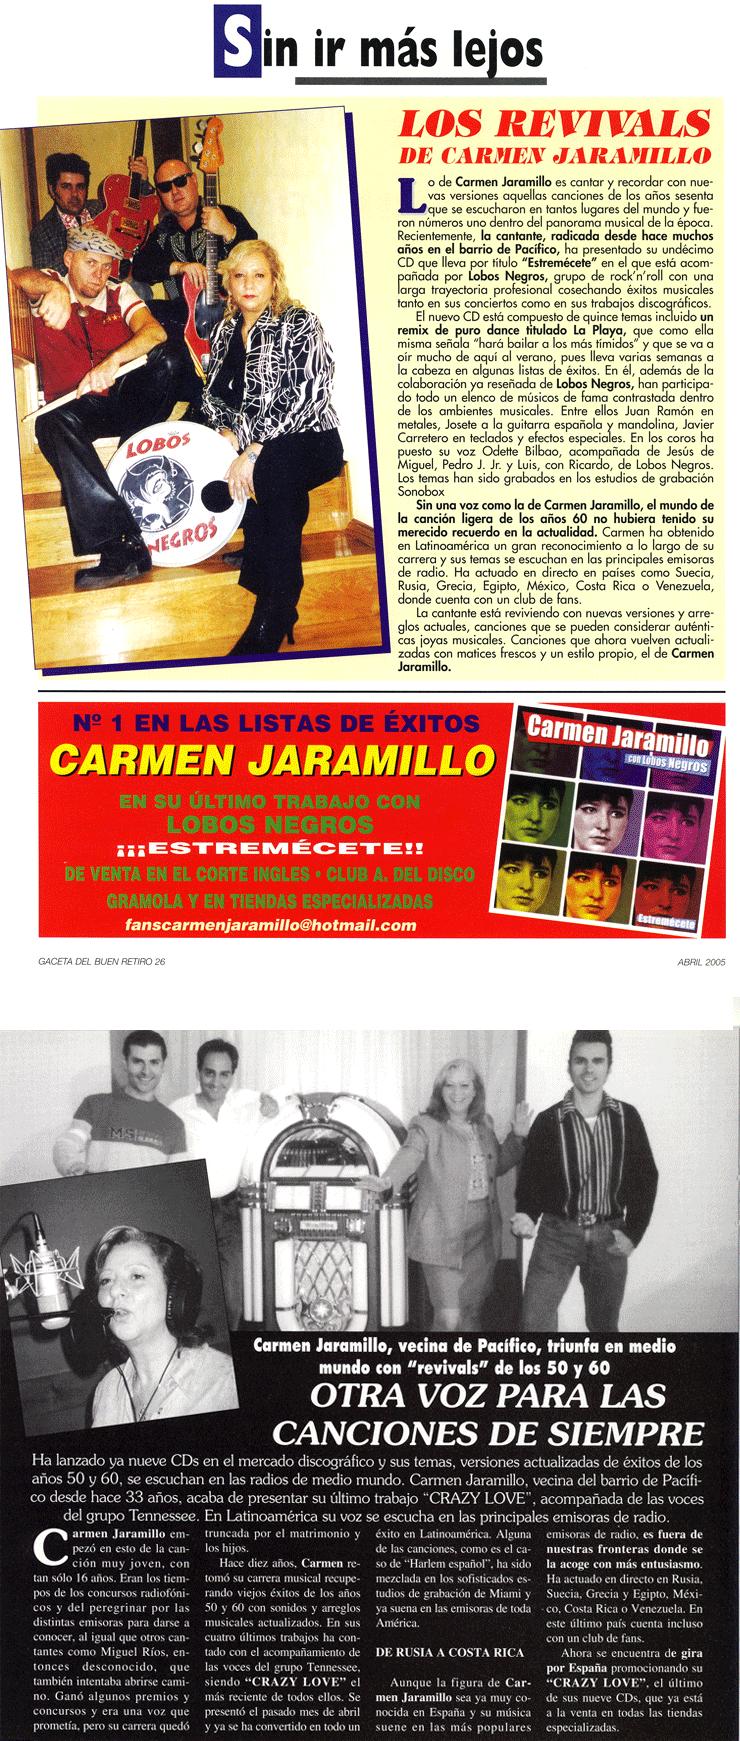 Carmen Jaramillo publicidad en Gaceta del Buen Retiro